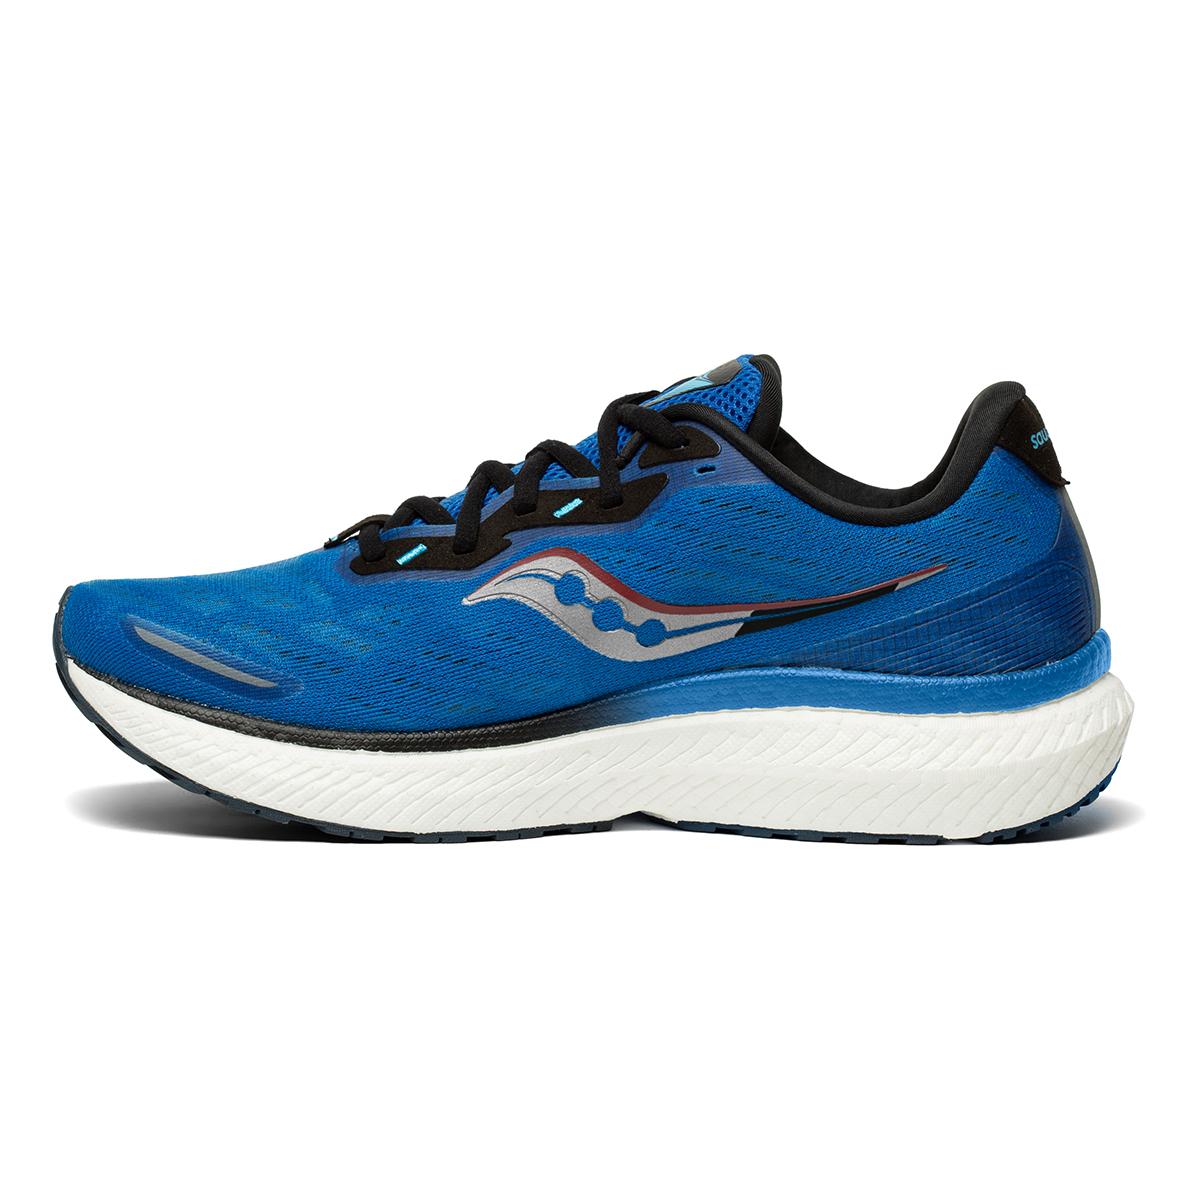 Men's Saucony Triumph 19 Running Shoe - Color: Royal / Space - Size: 7 - Width: Regular, Royal / Space, large, image 2